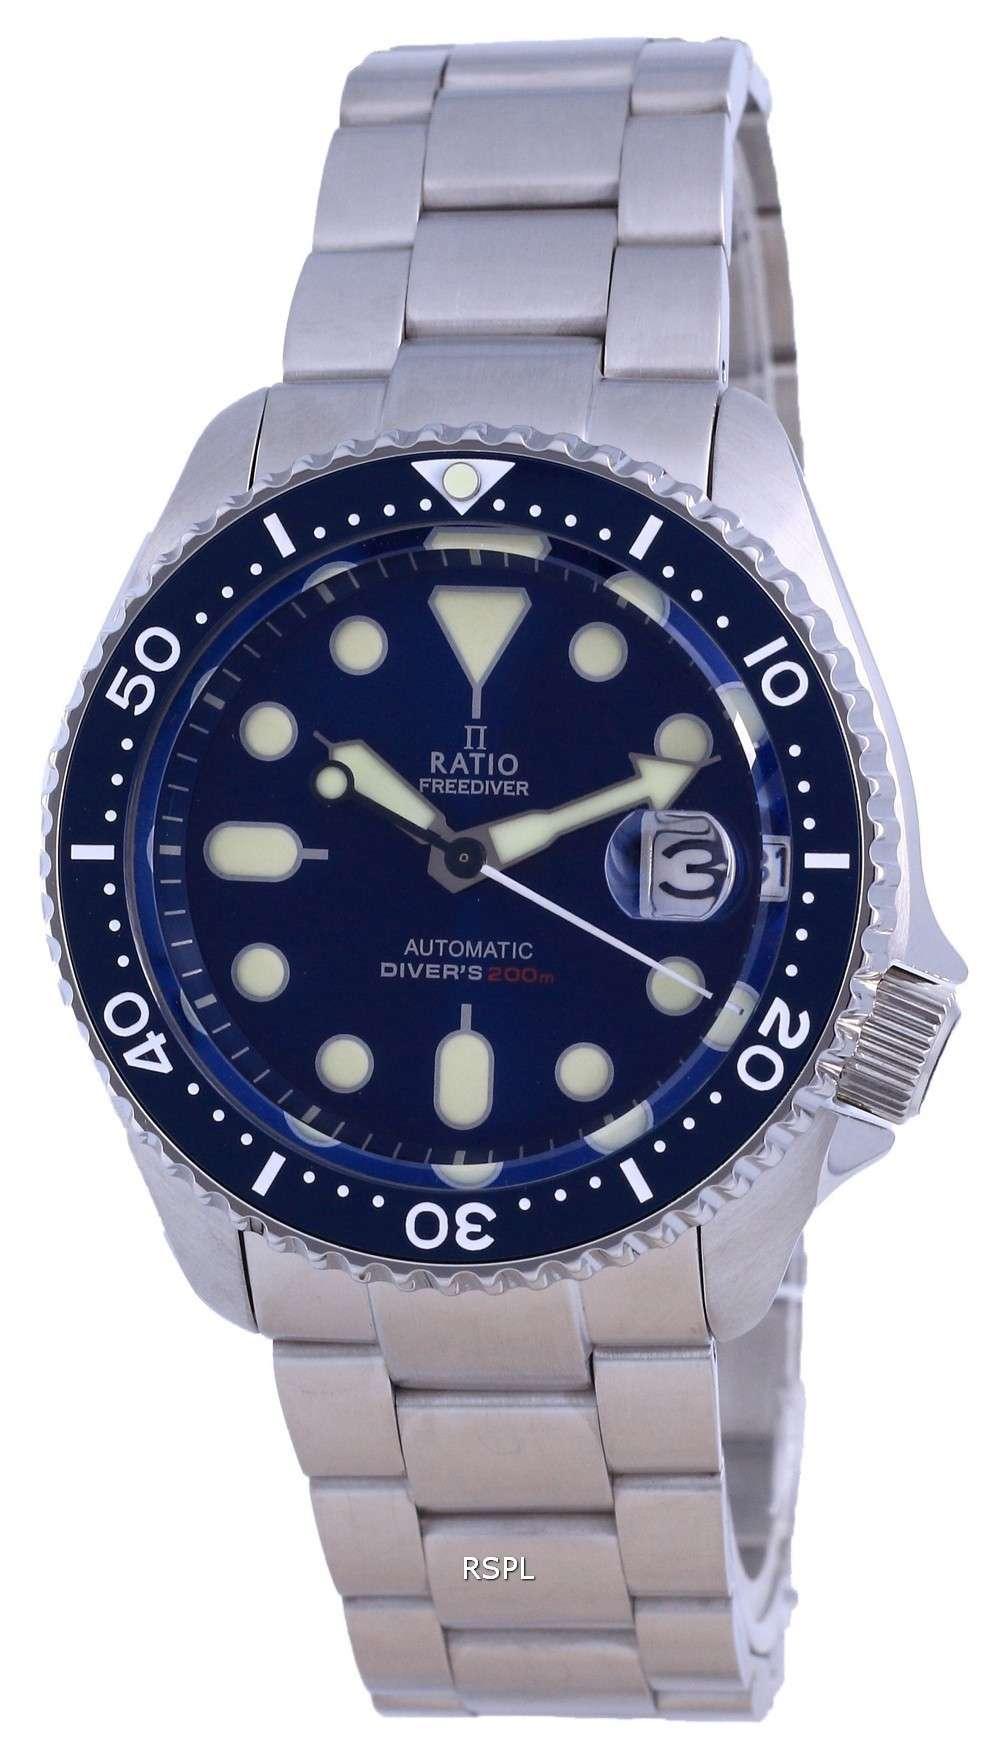 Ratio FreeDiver Dial azul Acero inoxidable Automático RTB202 200M Reloj para hombre